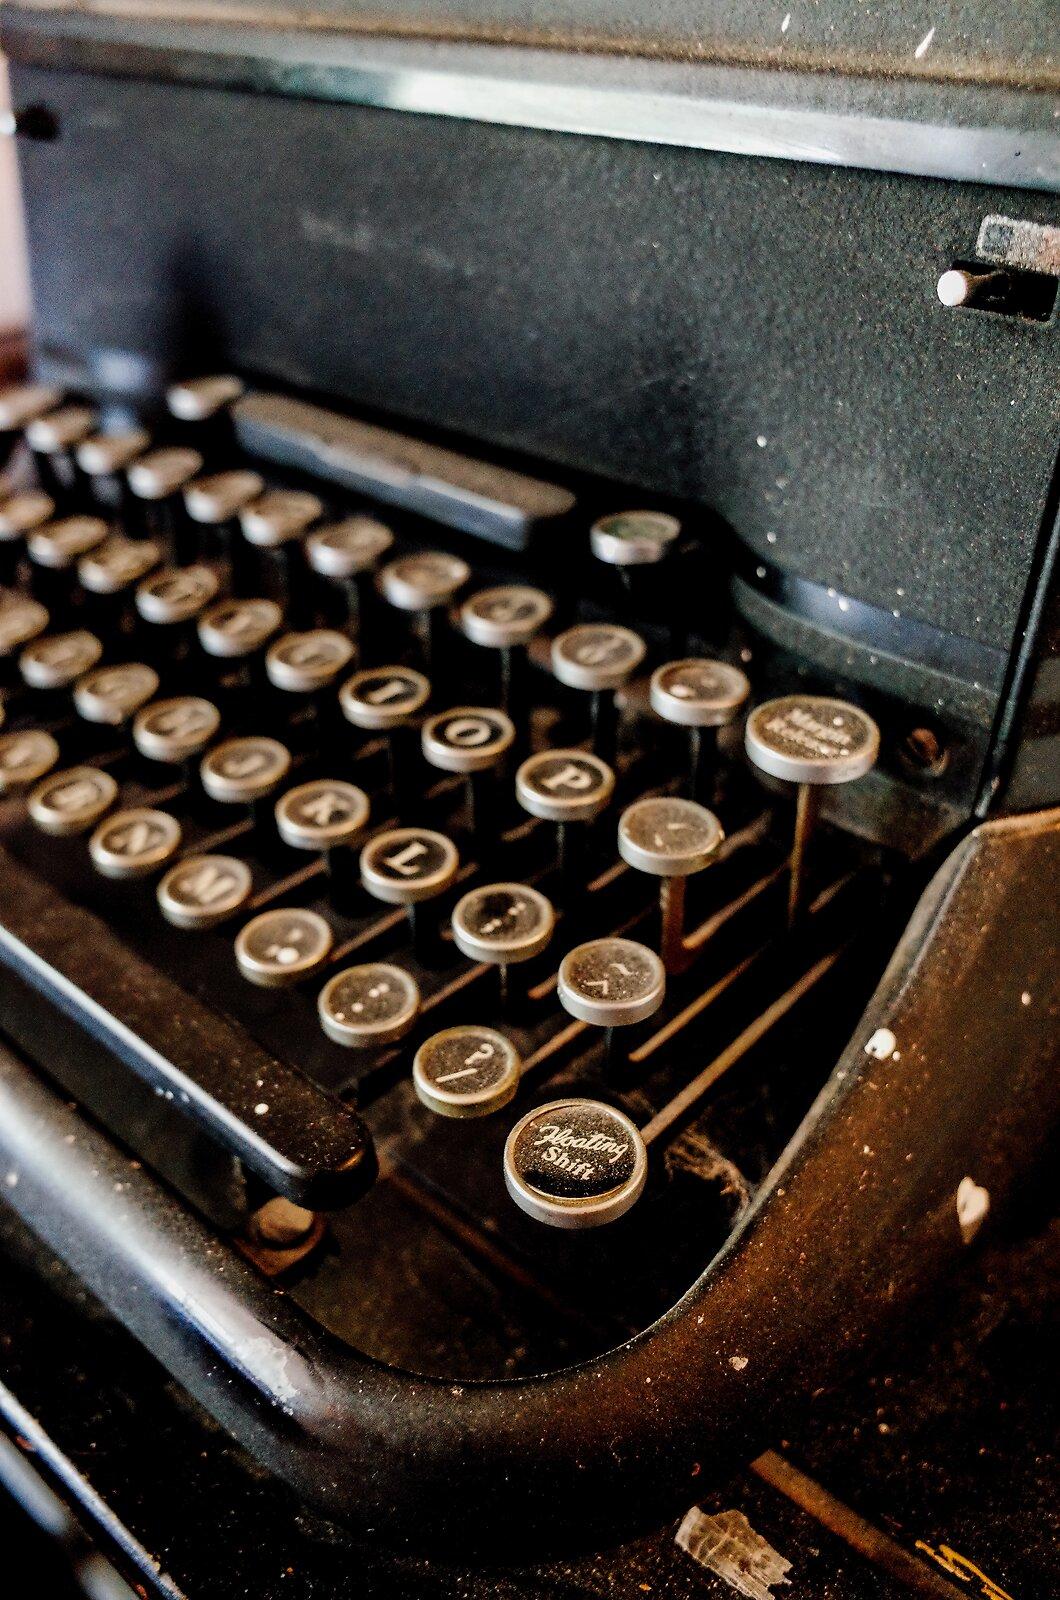 GRII_July19_Typewriter(PosFilm).jpg